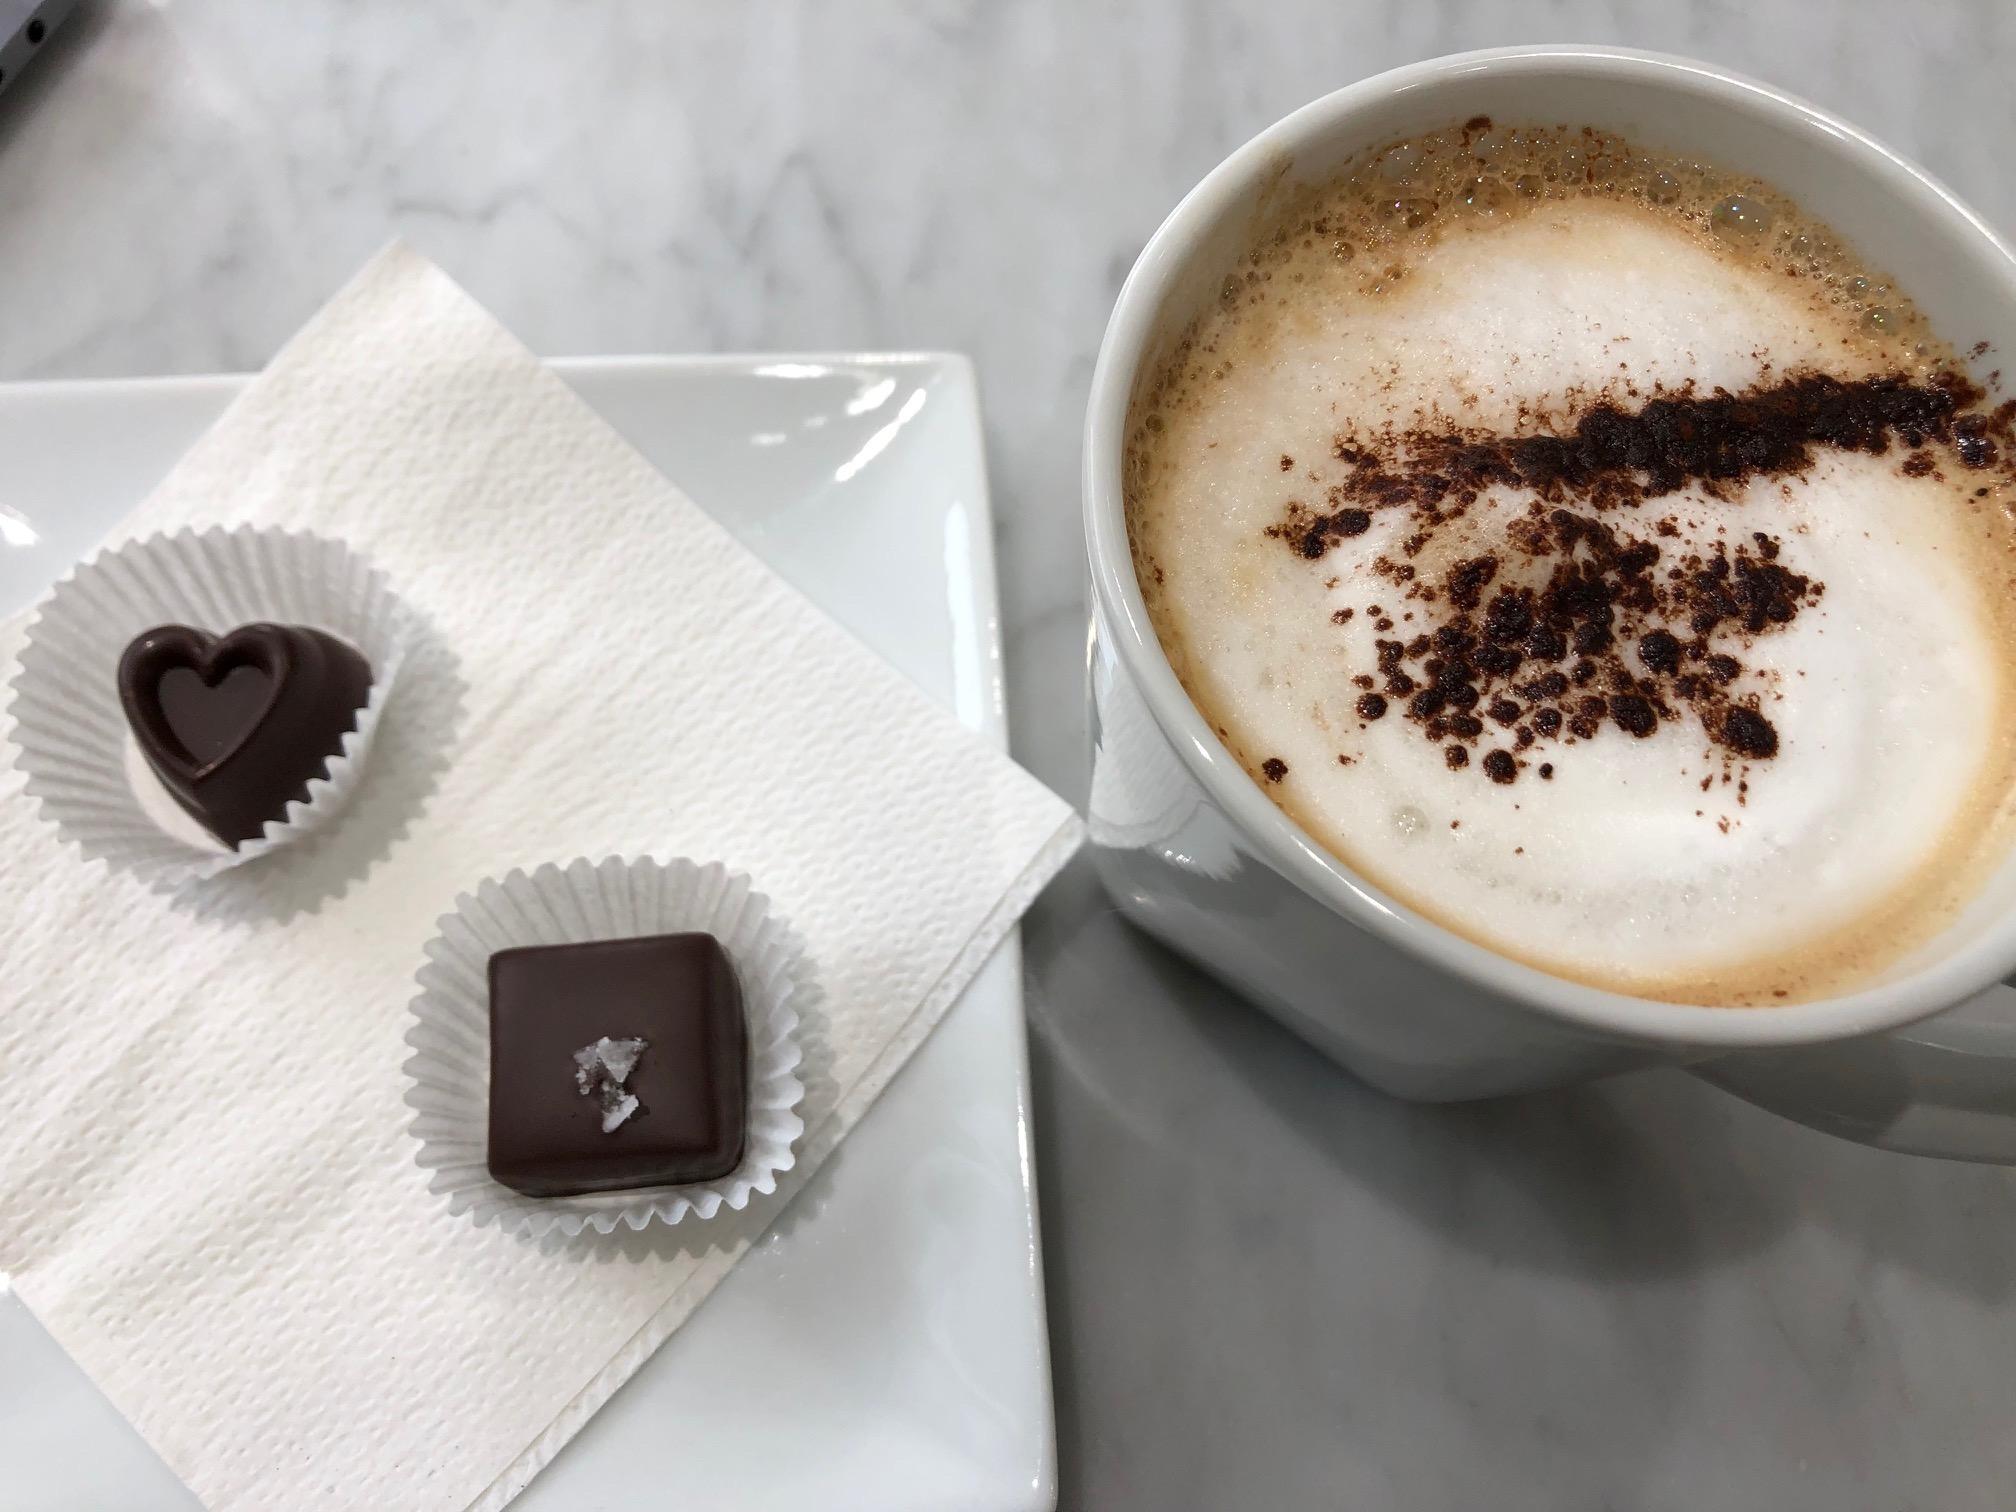 Sale Pending - Growing Chocolate Shop